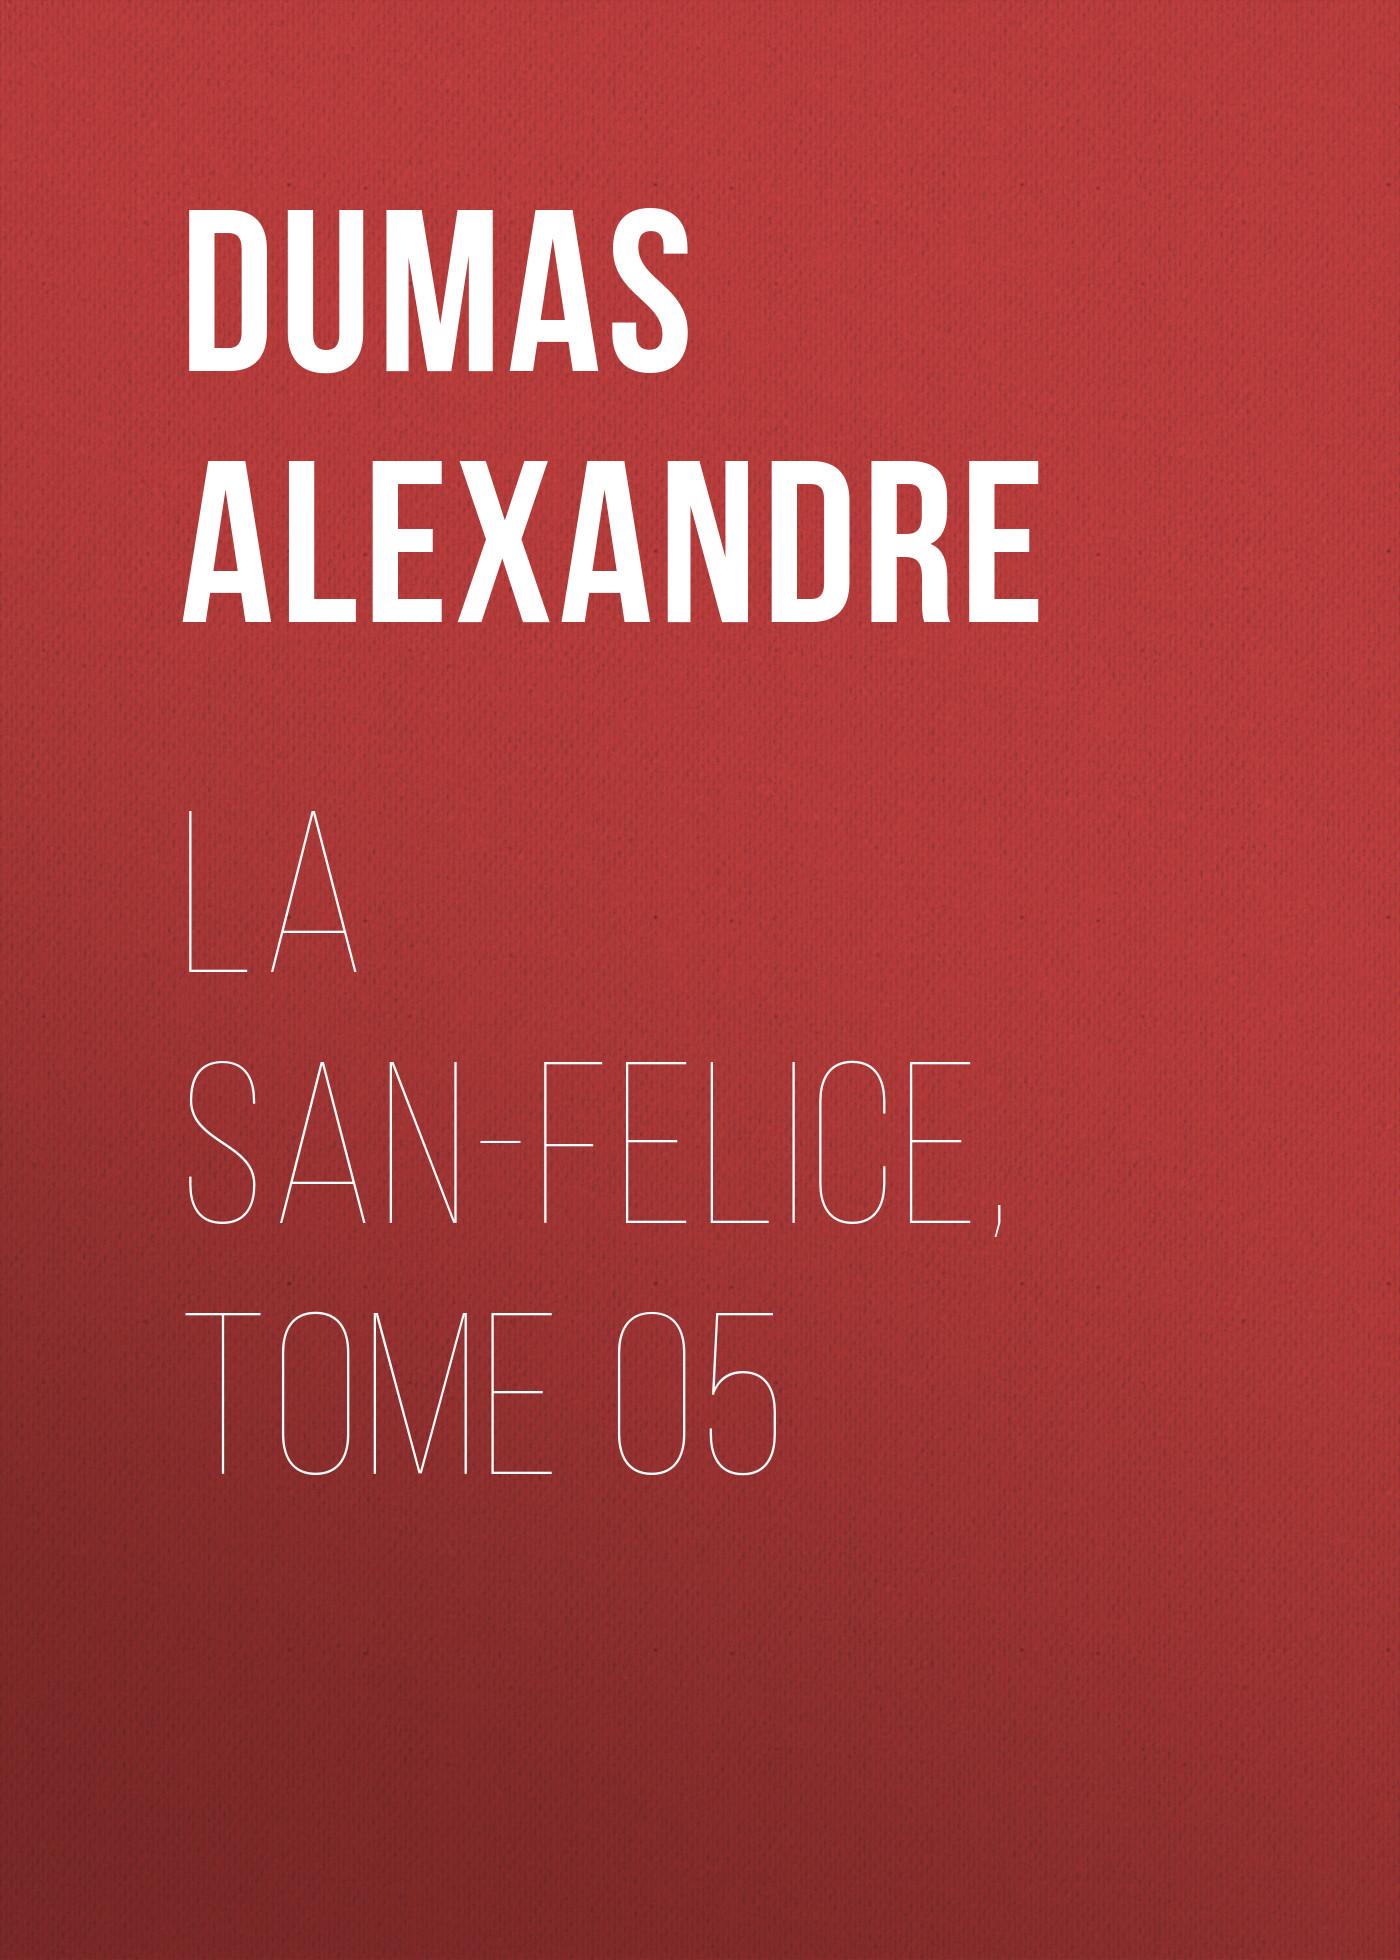 Александр Дюма La San-Felice, Tome 05 александр дюма les quarante cinq tome 1